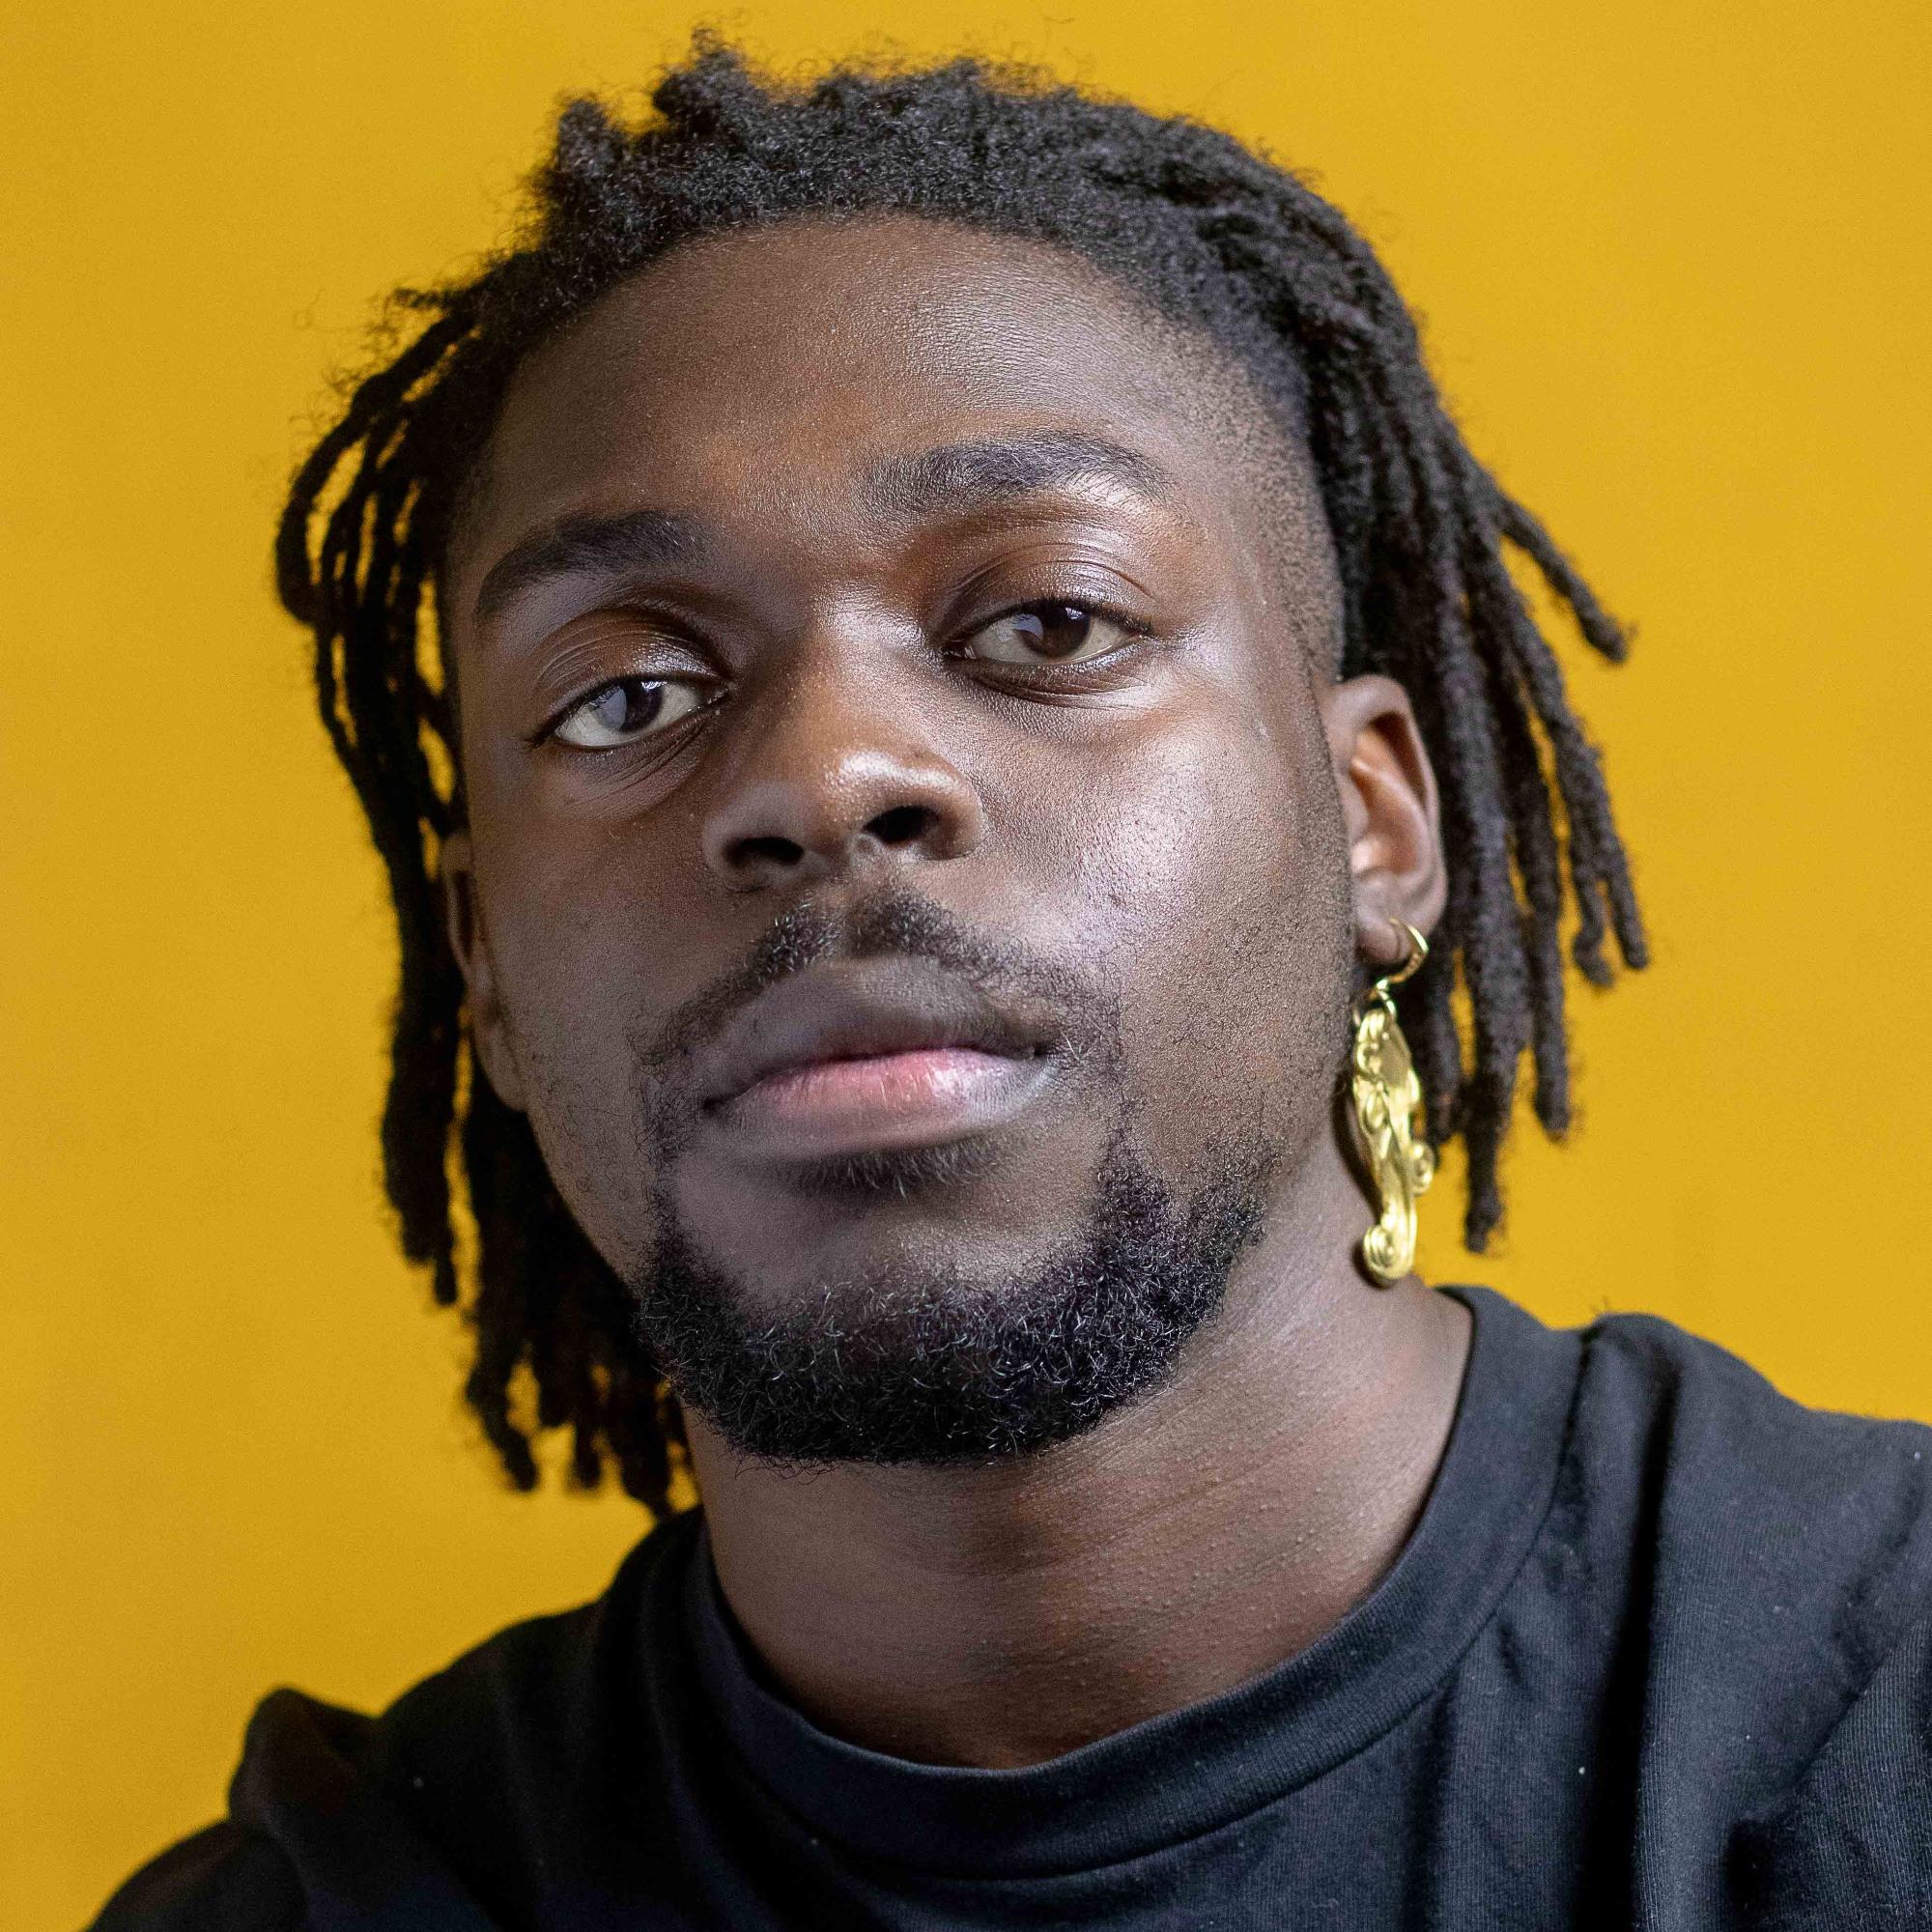 Politics and IR Graduates - Where are they now? Kojo Apeagyei, Charity Sector